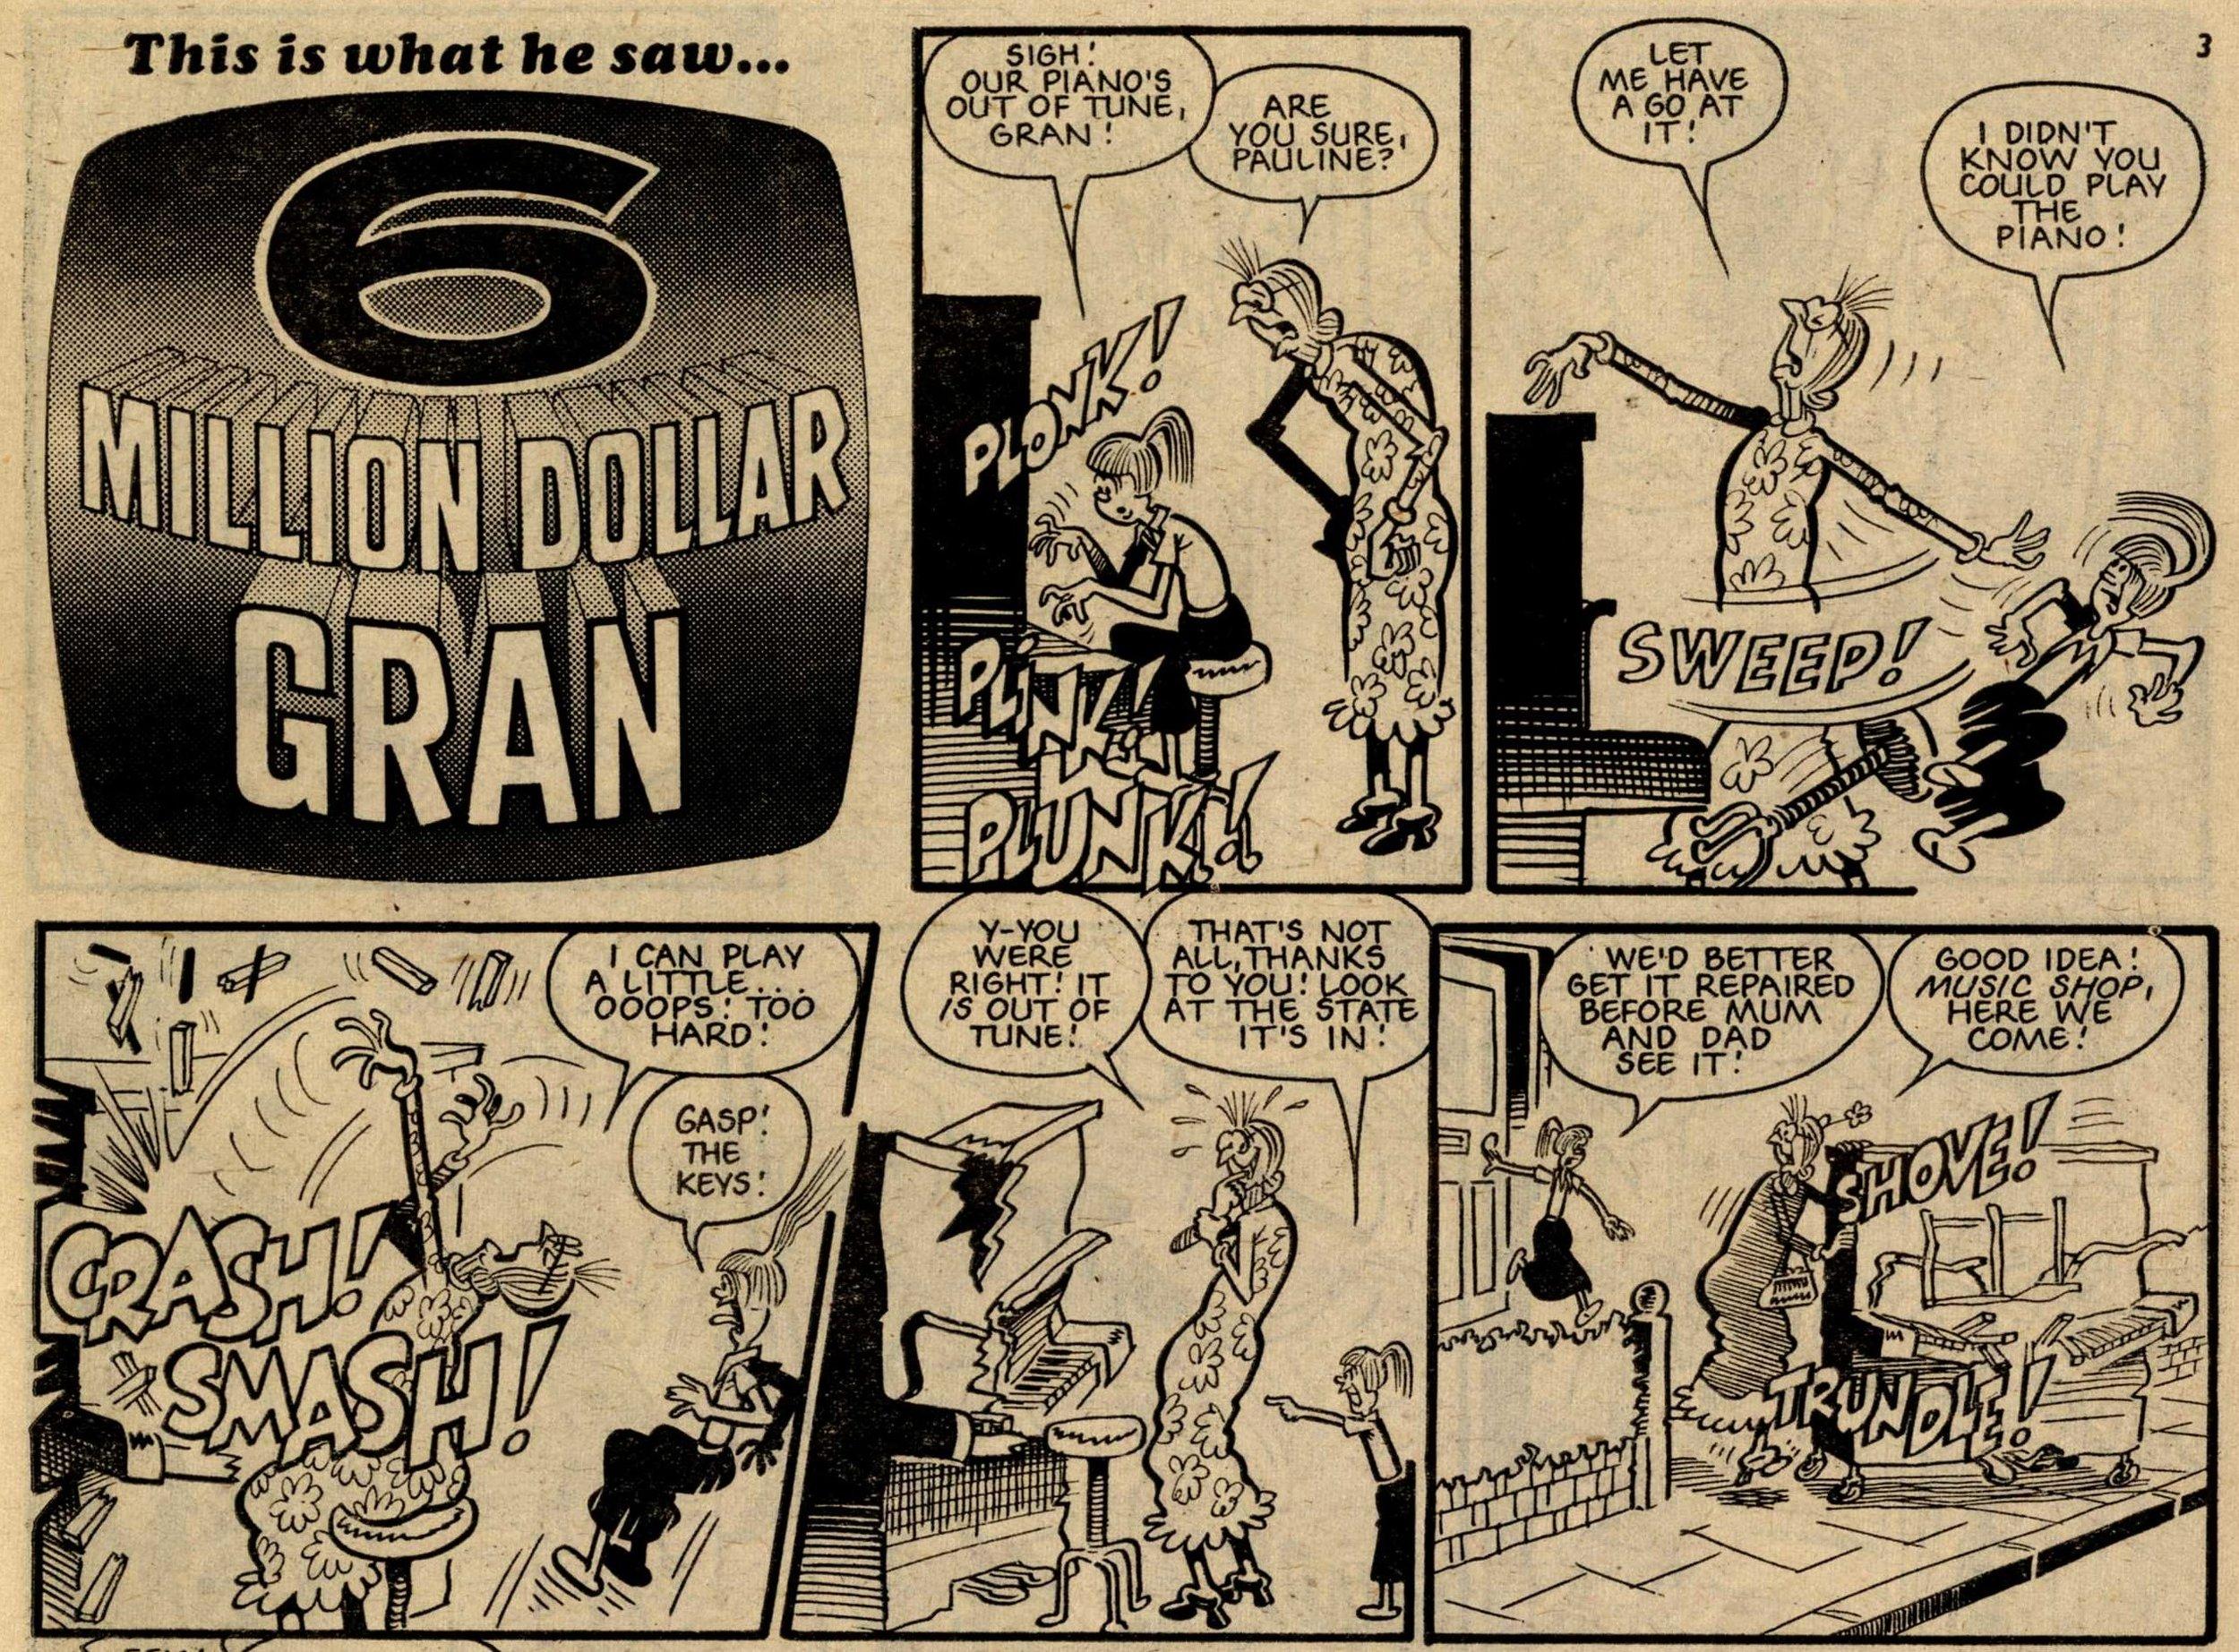 6 Million Dollar Gran: Ian Knox (artist)